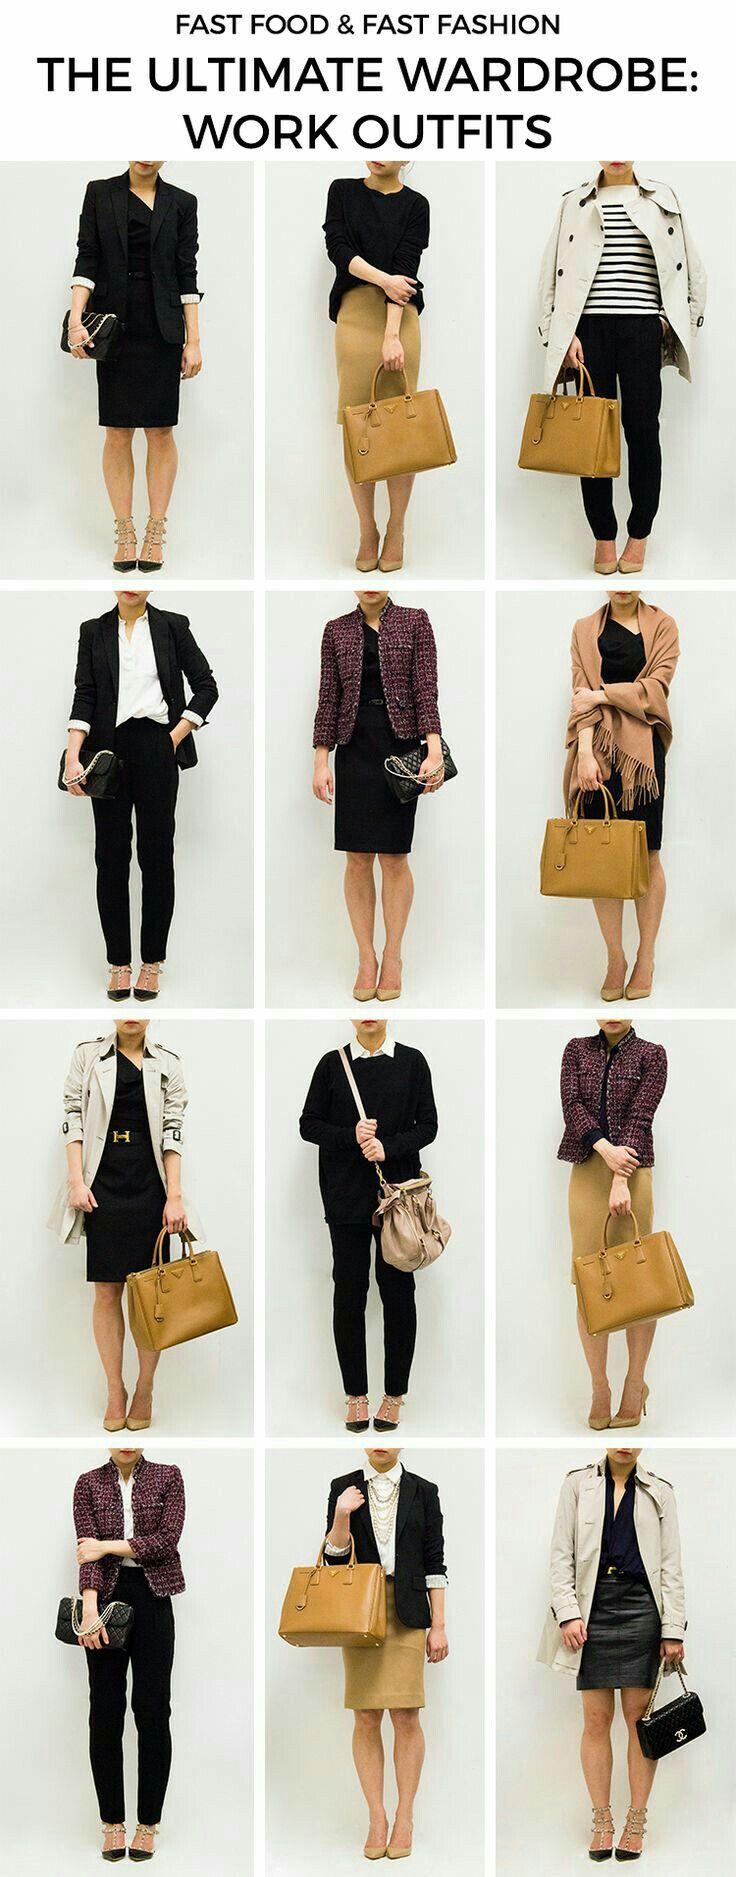 Poslovna garderoba